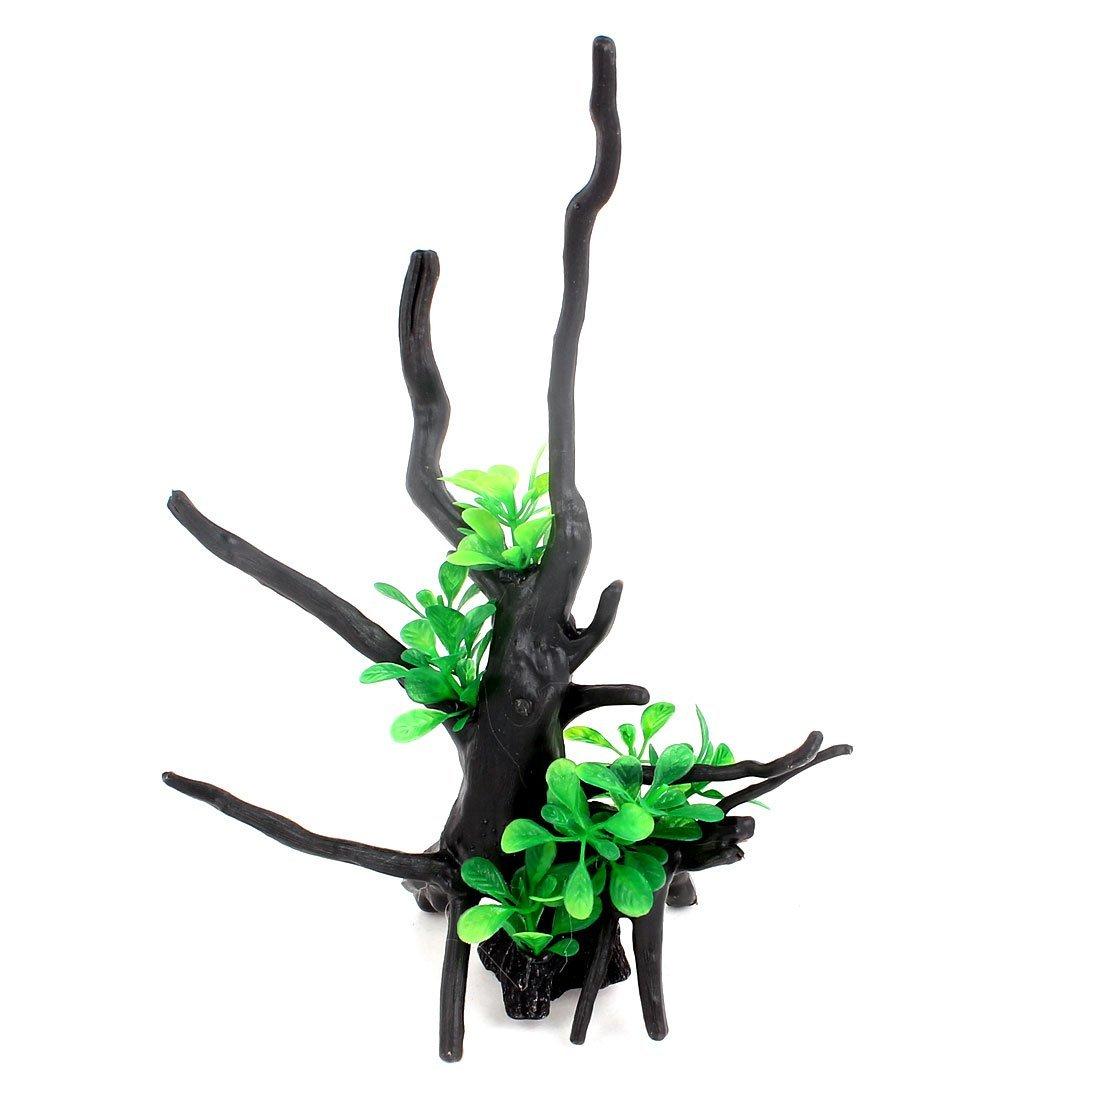 1Pc Silicone Aquarium Emulational Artificial Plant Coral Ornament 9cm Height Green